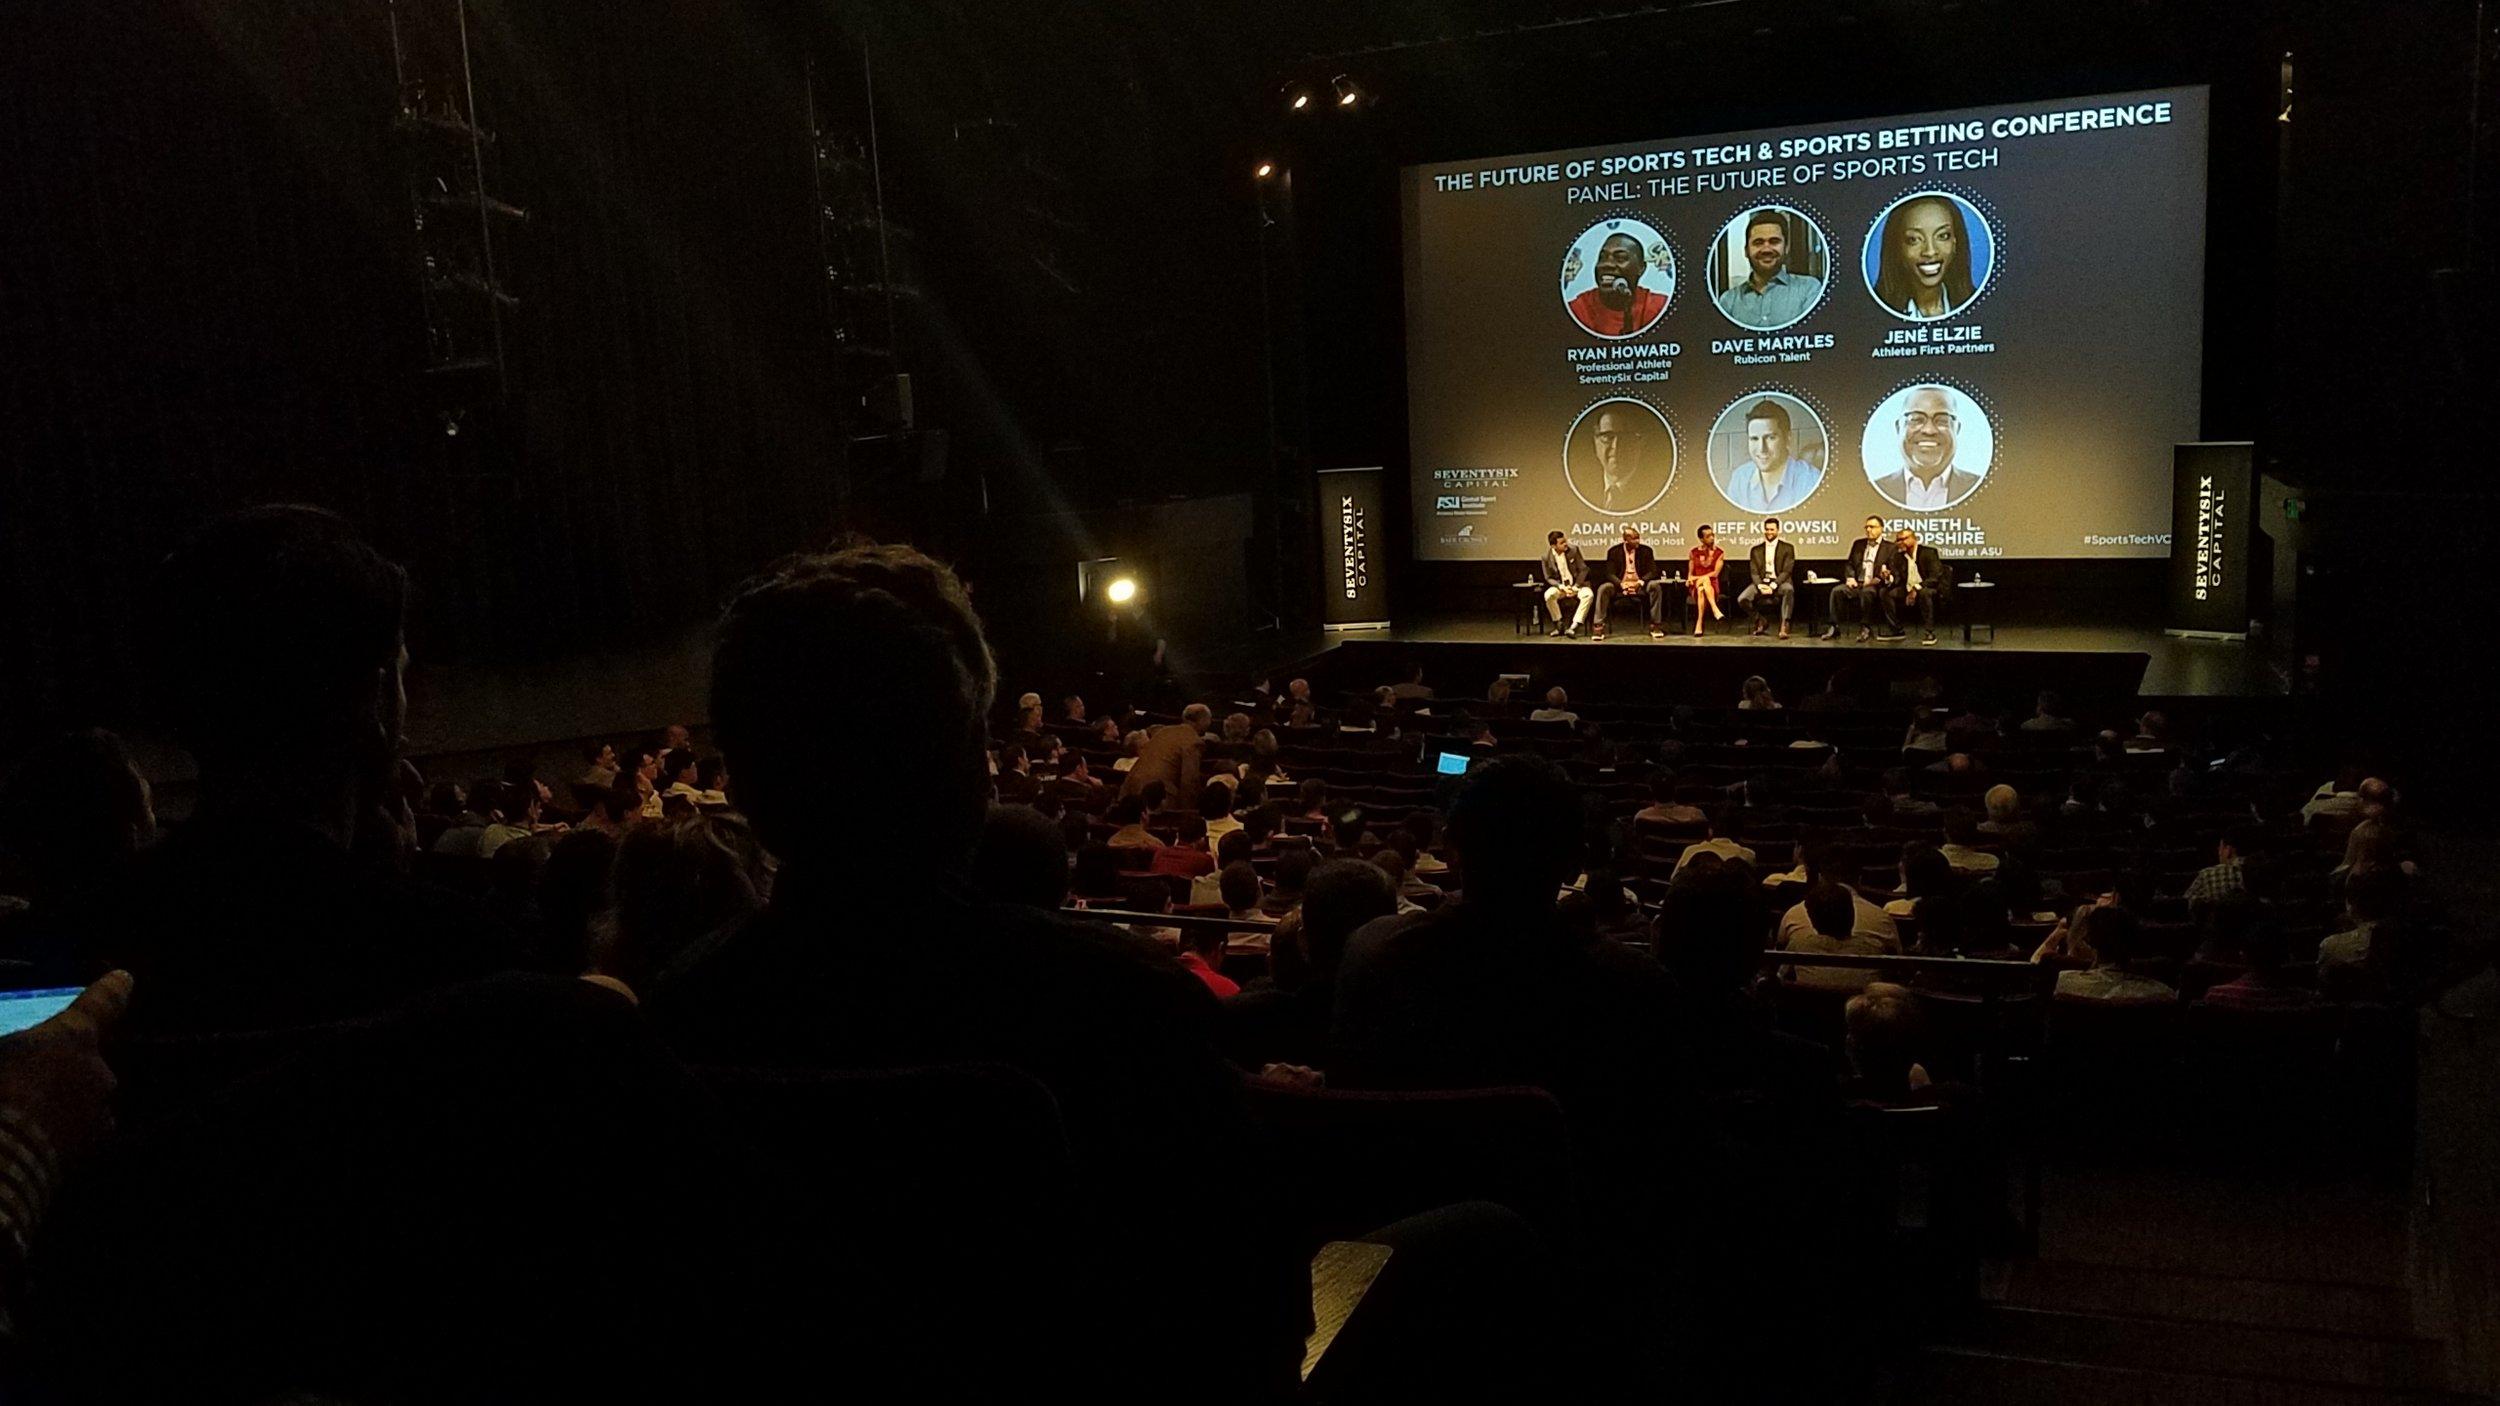 SeventySix_Capital_Sports_Tech_Conference.jpg